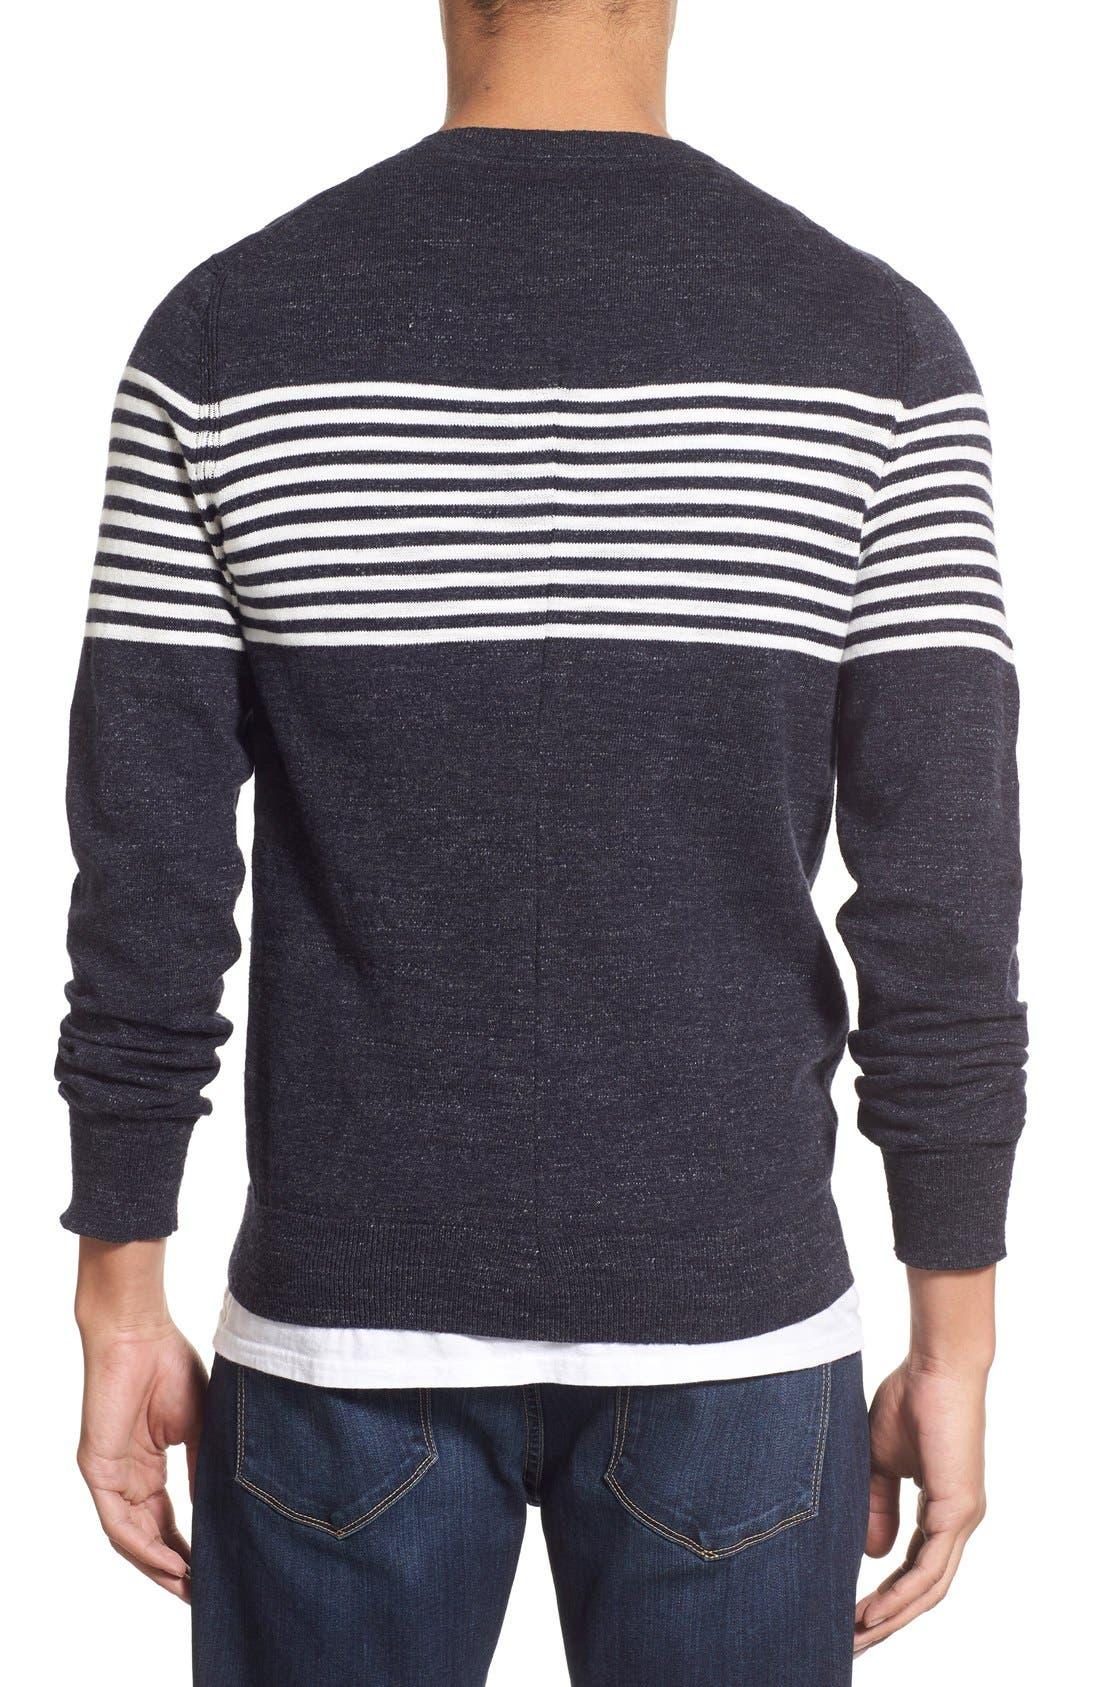 'Shore Club' Chest Stripe Crewneck Sweater,                             Alternate thumbnail 2, color,                             Navy